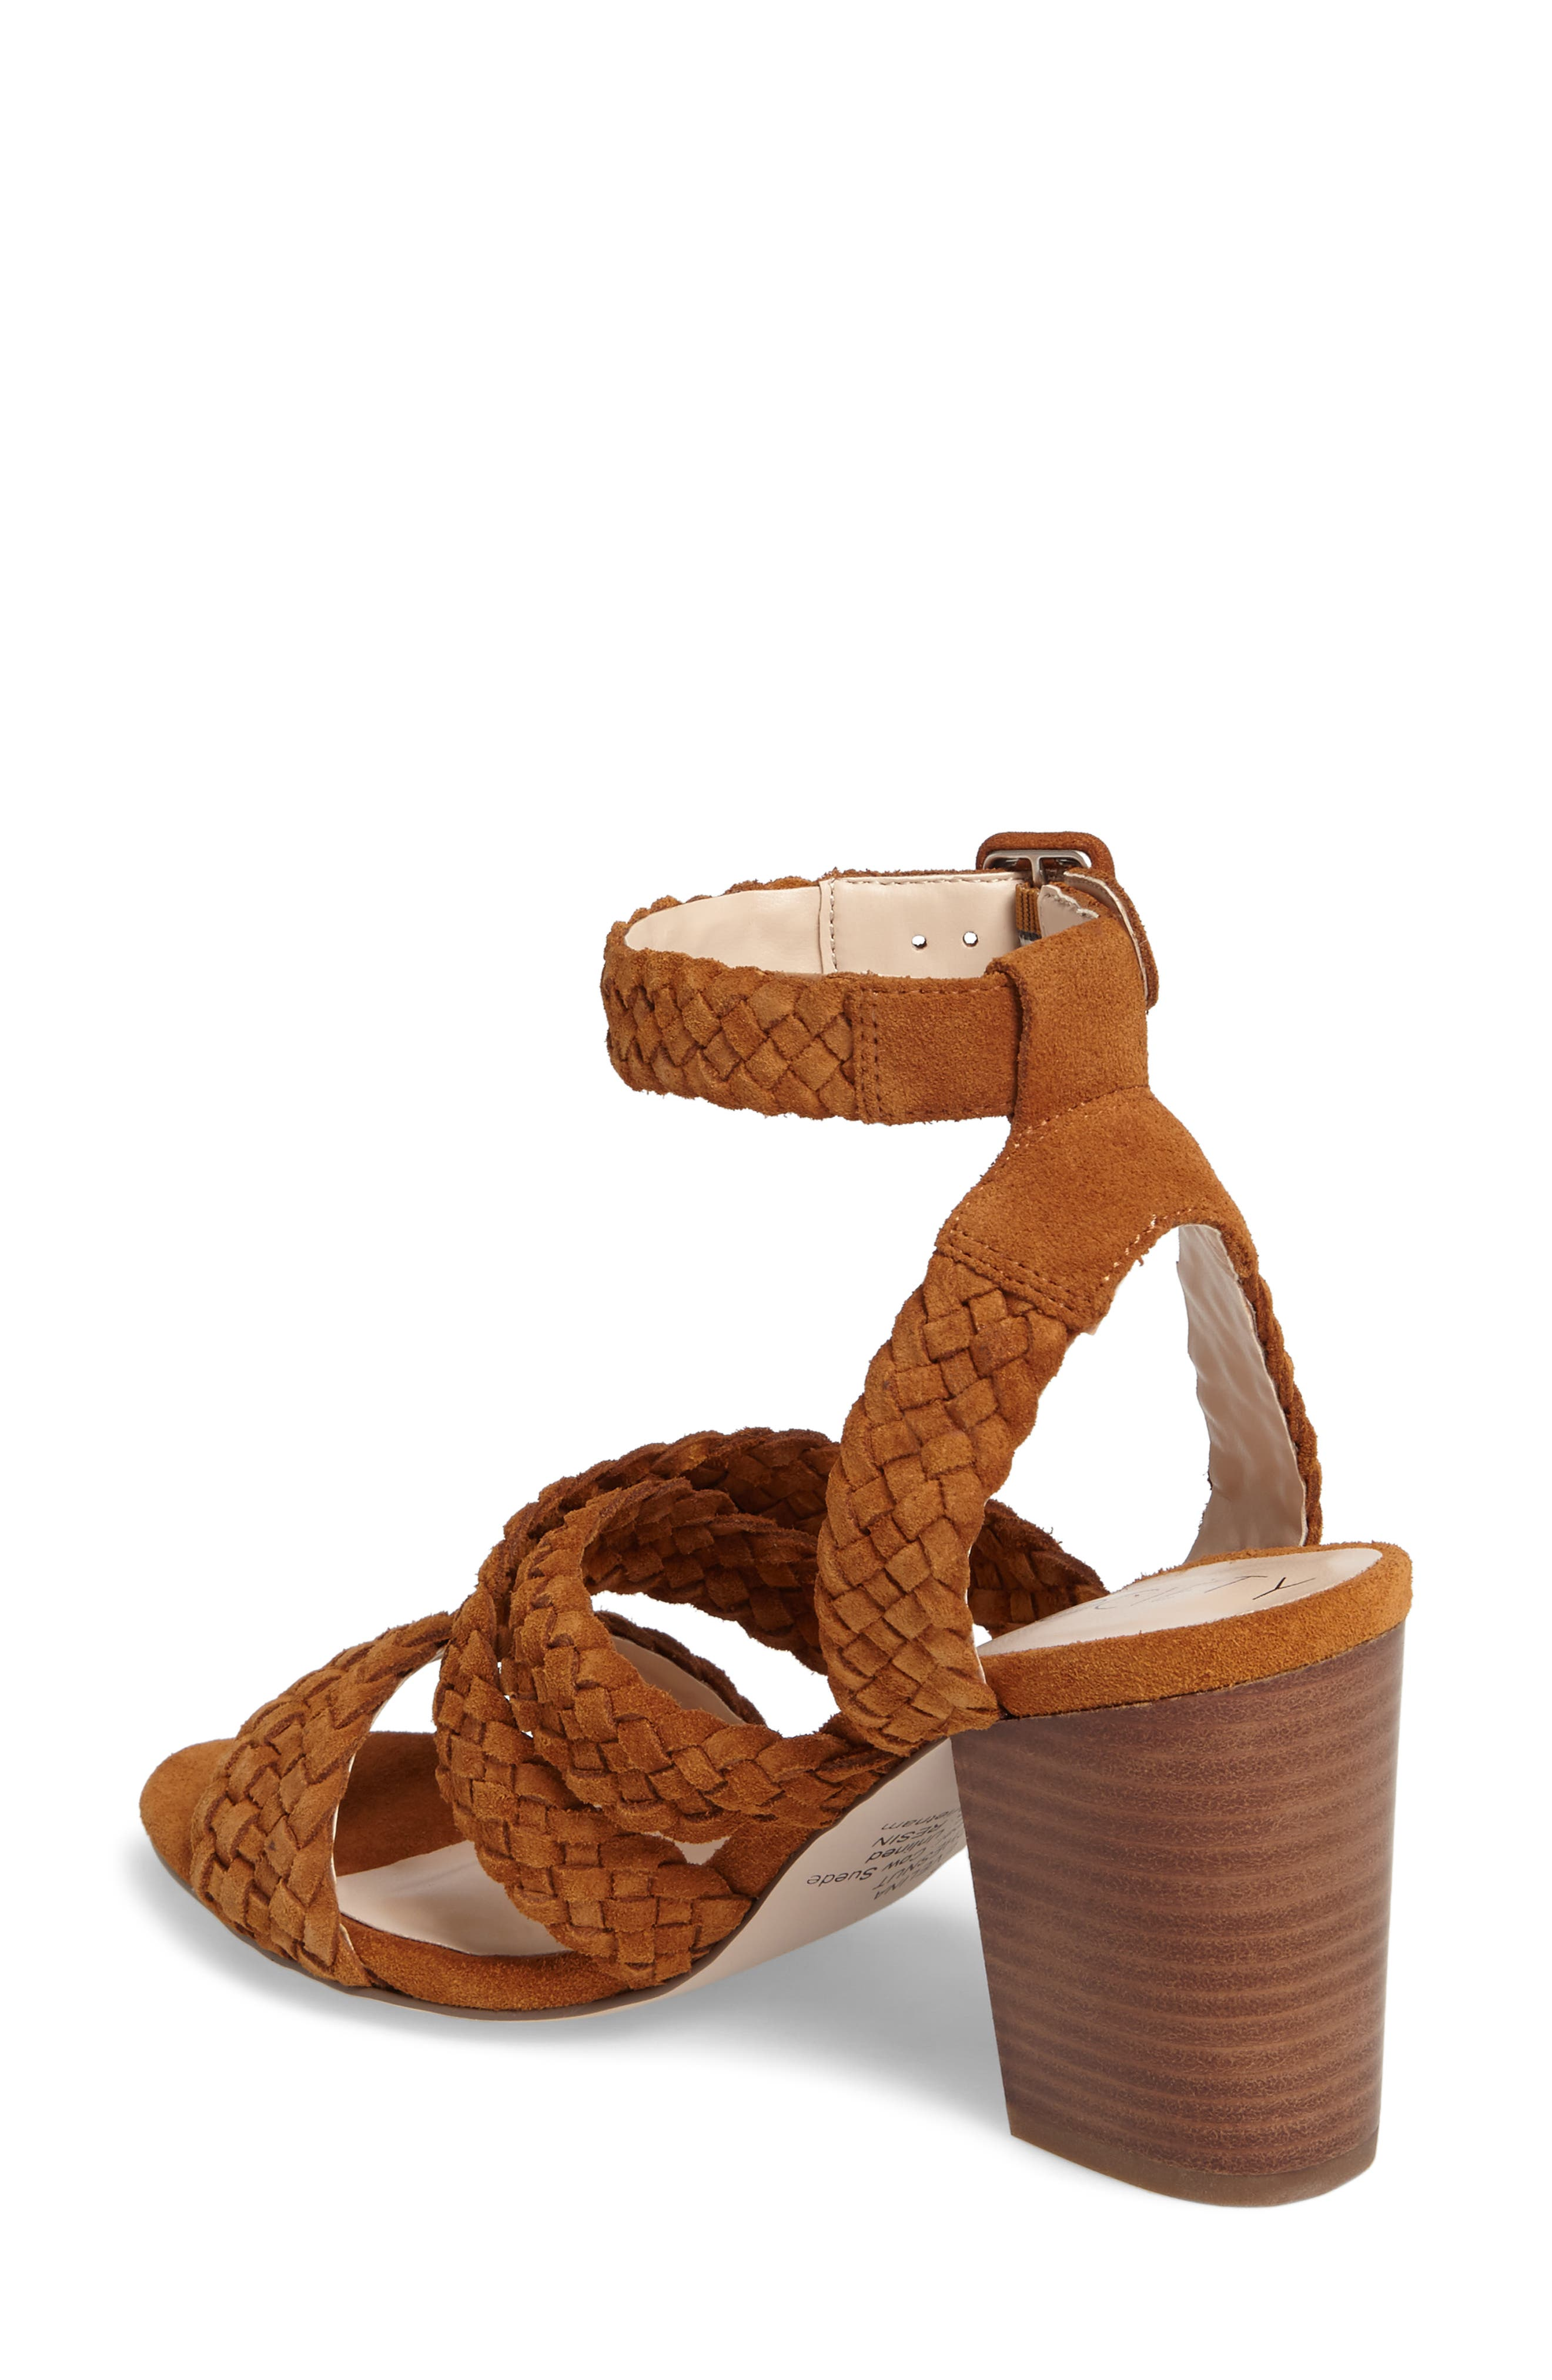 SOLE SOCIETY,                             Evelina Block Heel Sandal,                             Alternate thumbnail 2, color,                             240